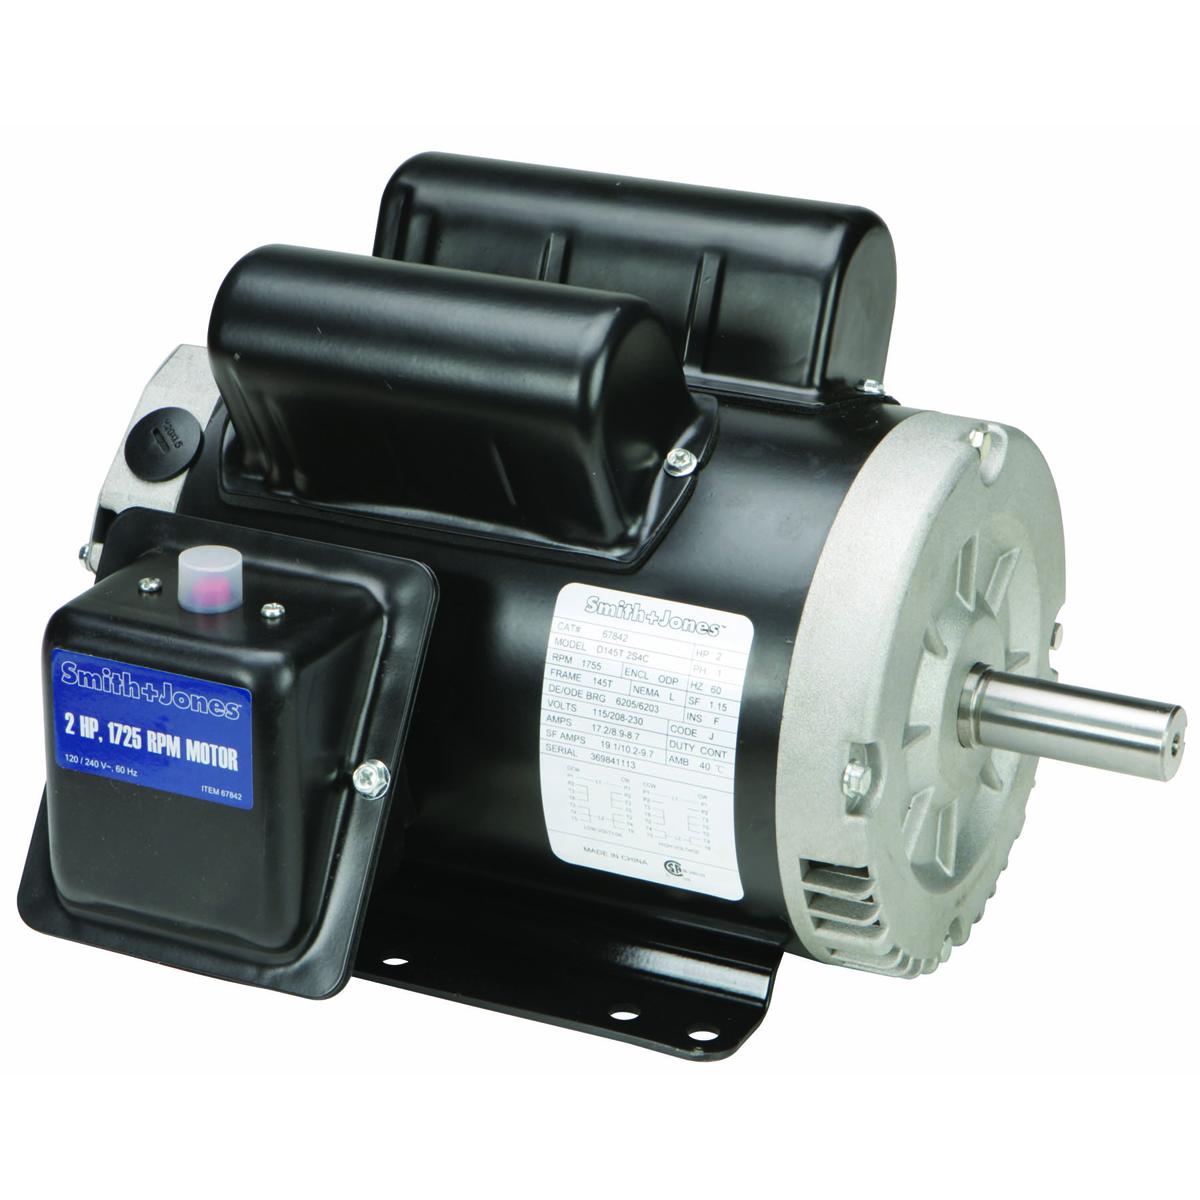 SMITH + JONES 2 HP Compressor Duty Motor - Item 67842